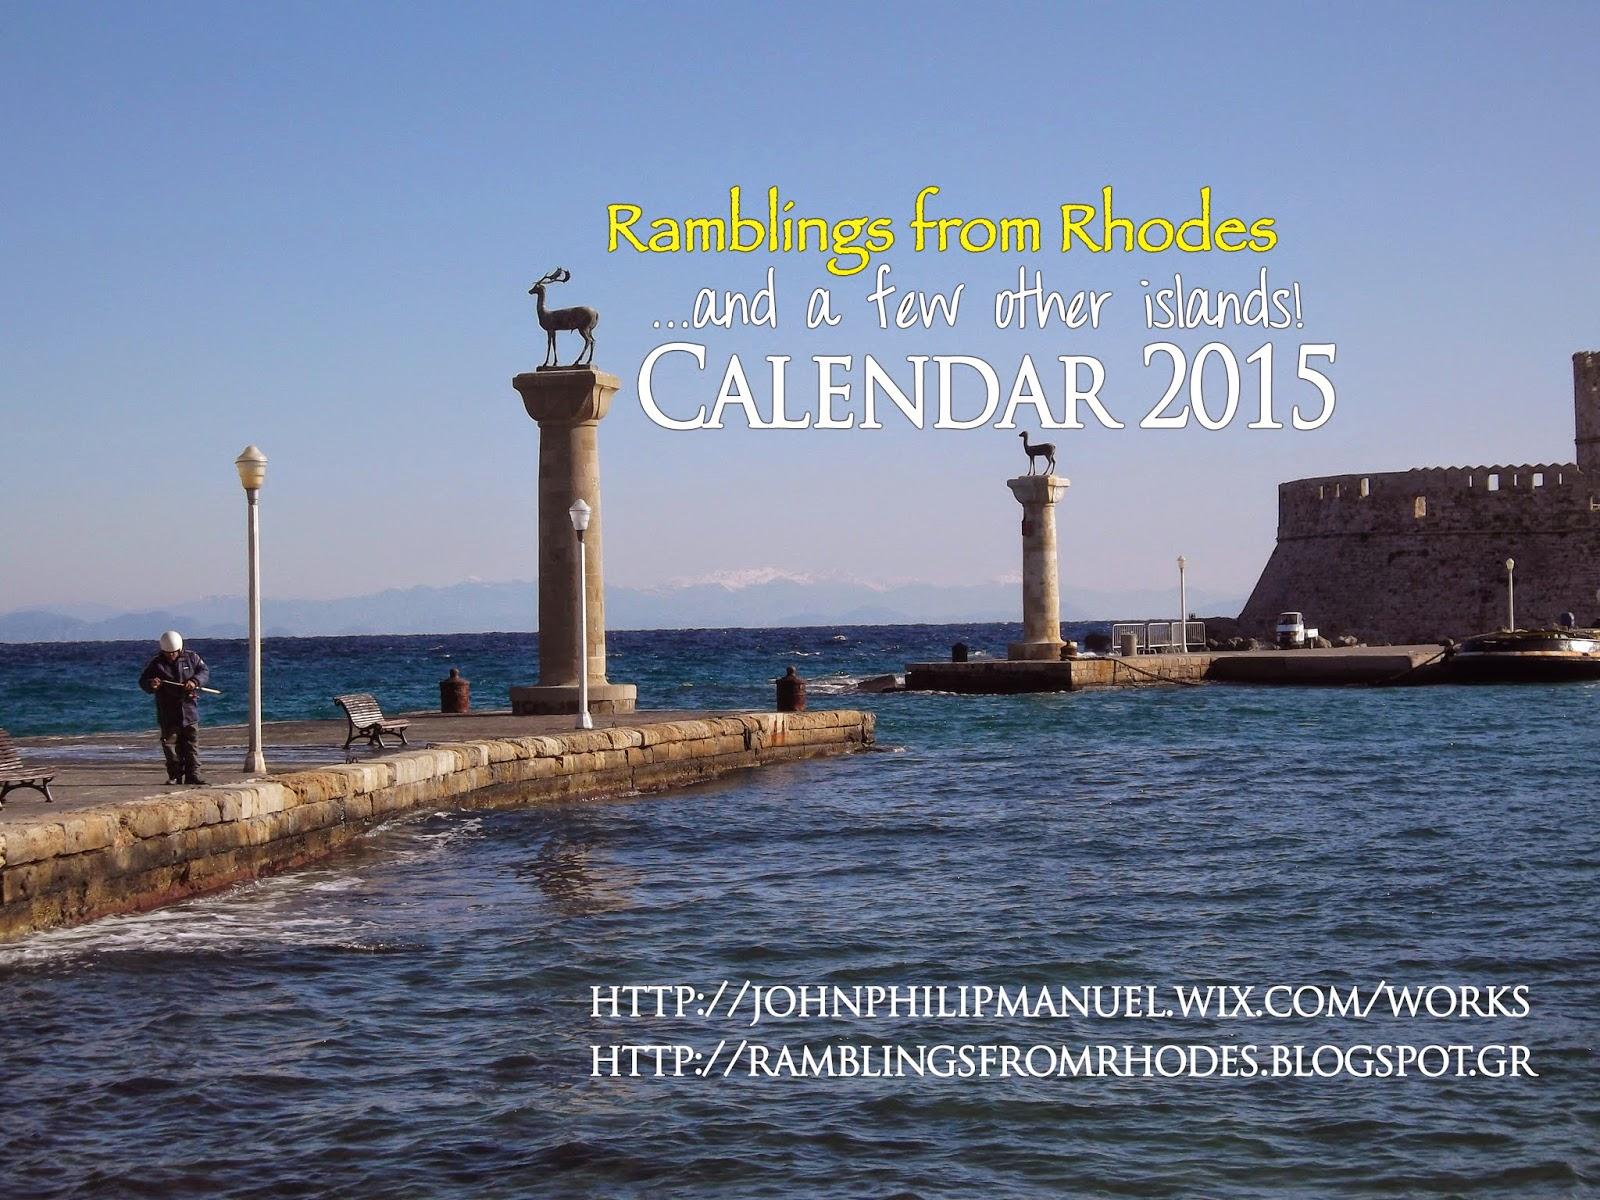 http://www.lulu.com/shop/john-manuel/ramblings-from-rhodes-calendar-2015/calendar/product-21616753.html